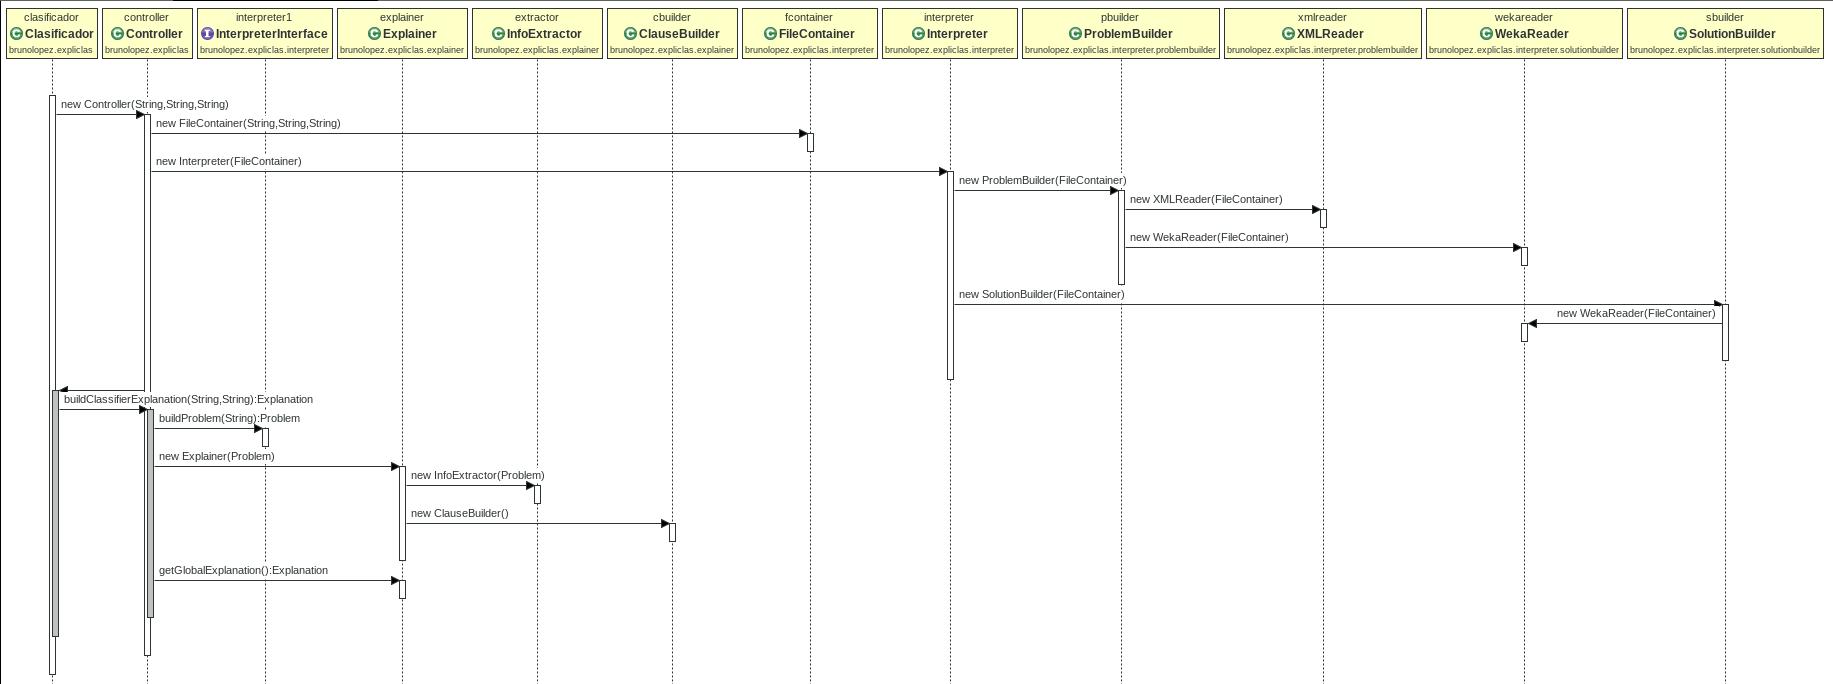 documentacion/memoria/figuras/secuenciaGlobal.png